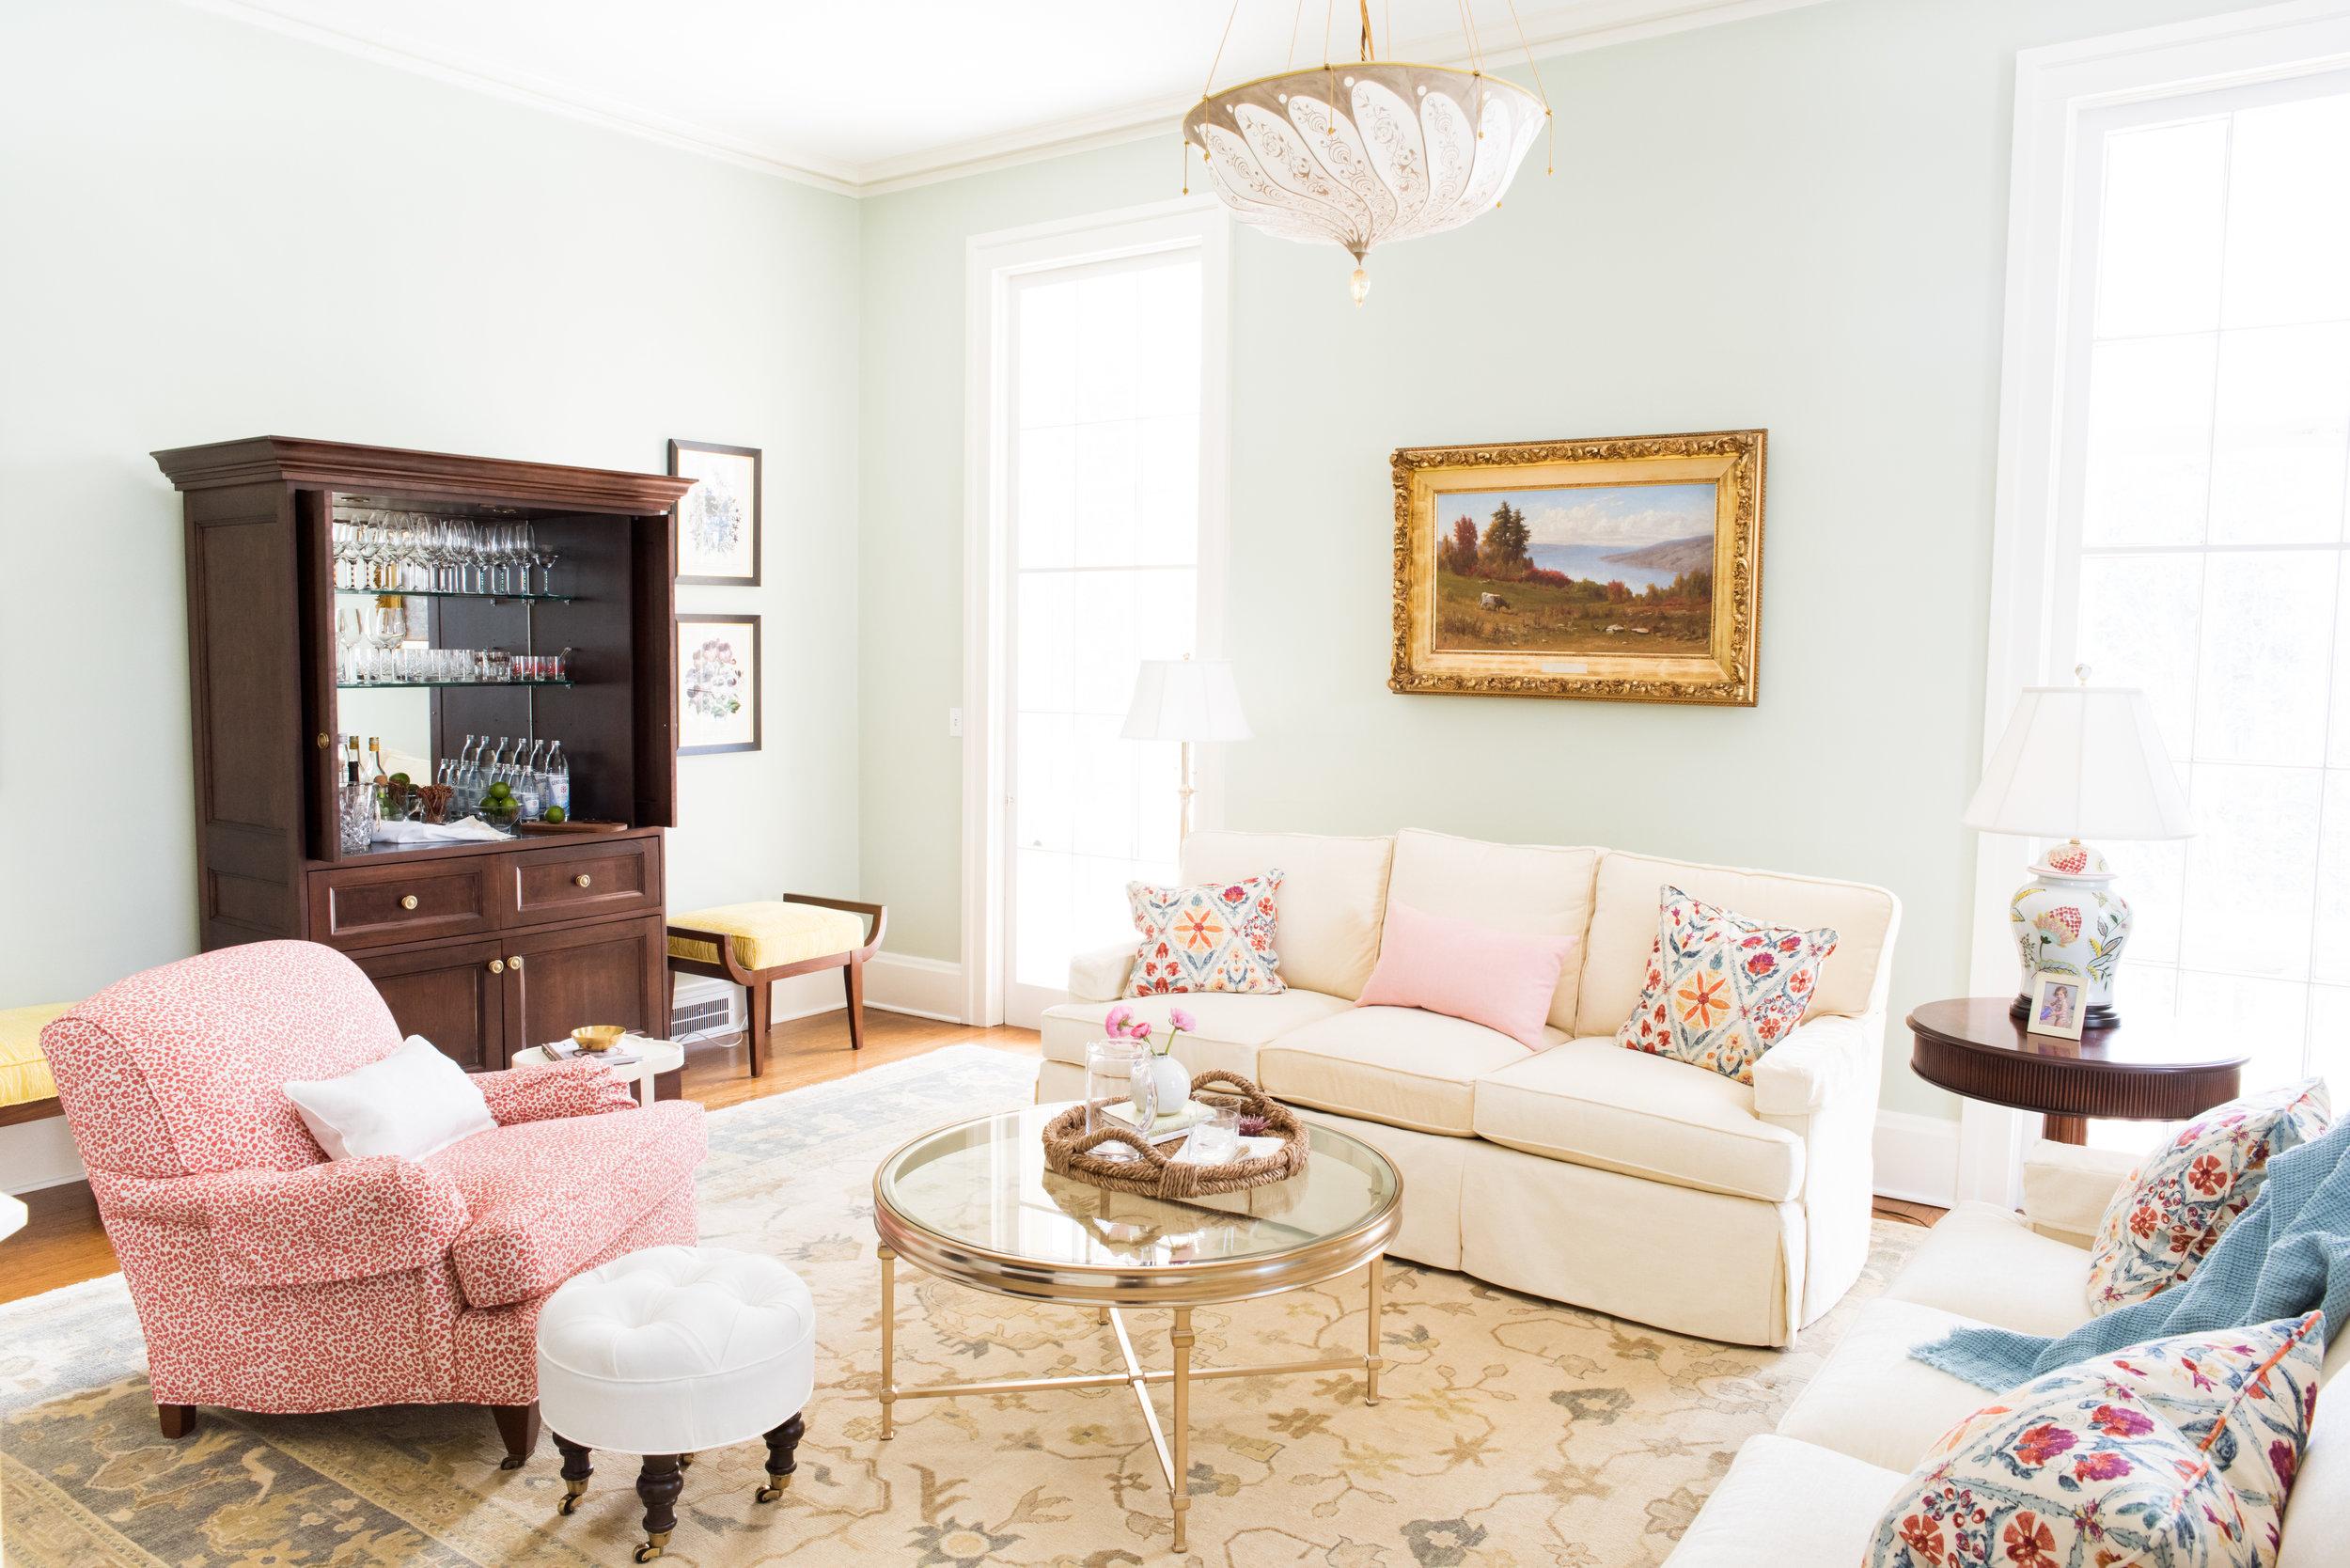 teaselwood-design-formal-living-room-0005.jpg